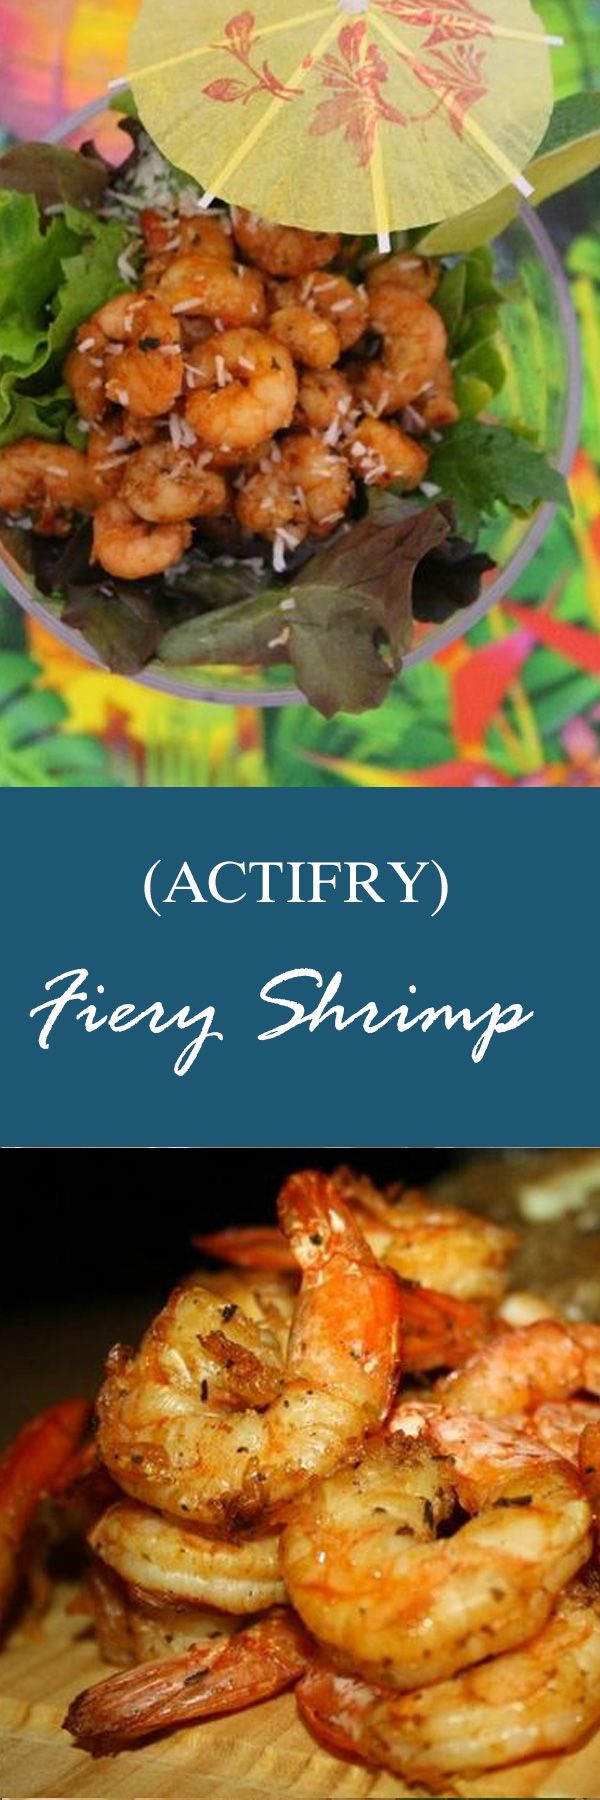 Fiery Shrimp - Actifry recipe. Simply heavenly!